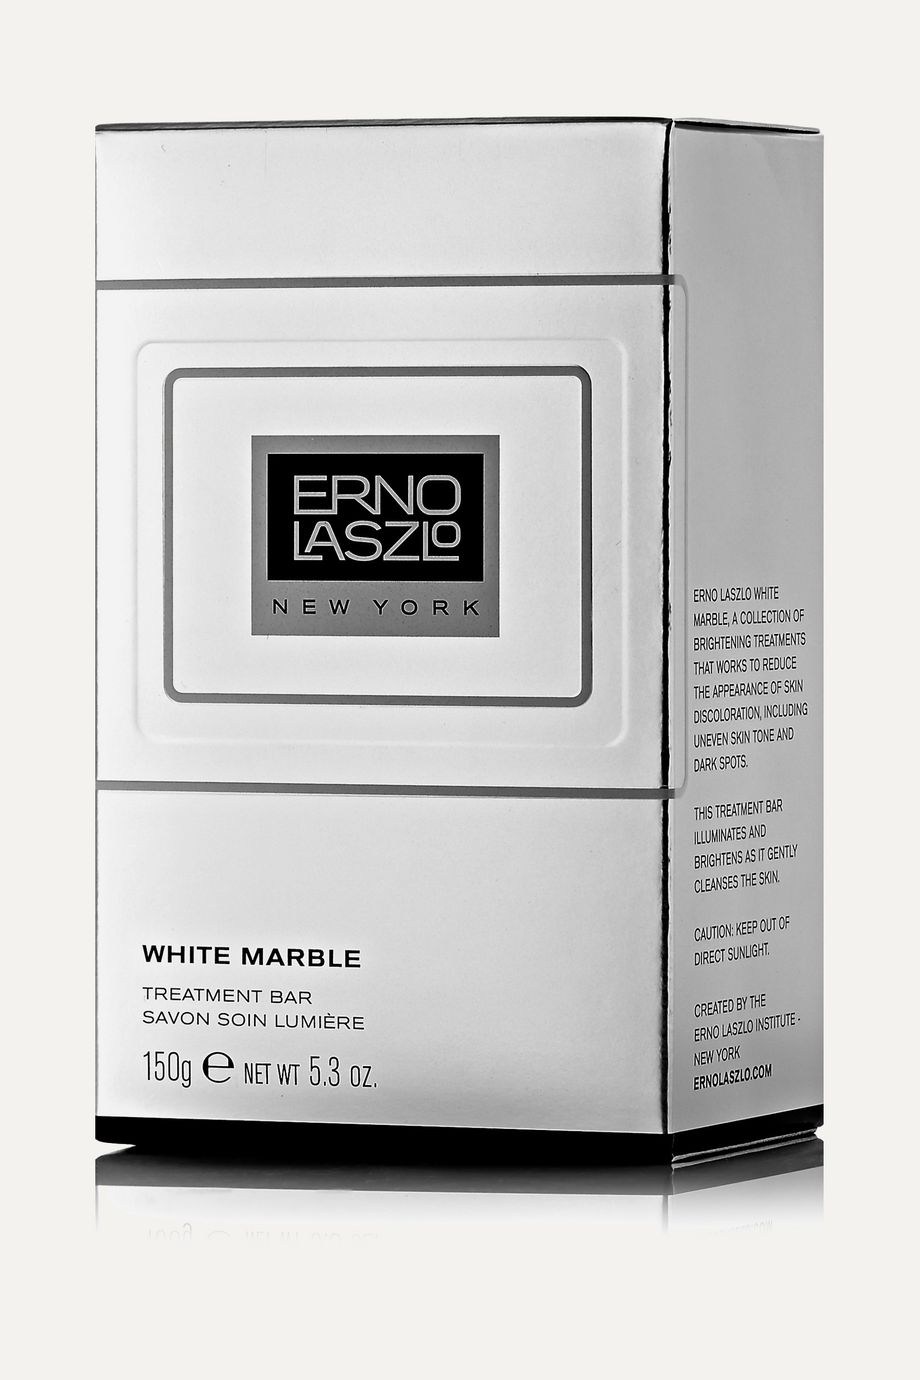 Erno Laszlo White Marble Treatment Bar, 100 g – Gesichtsseife